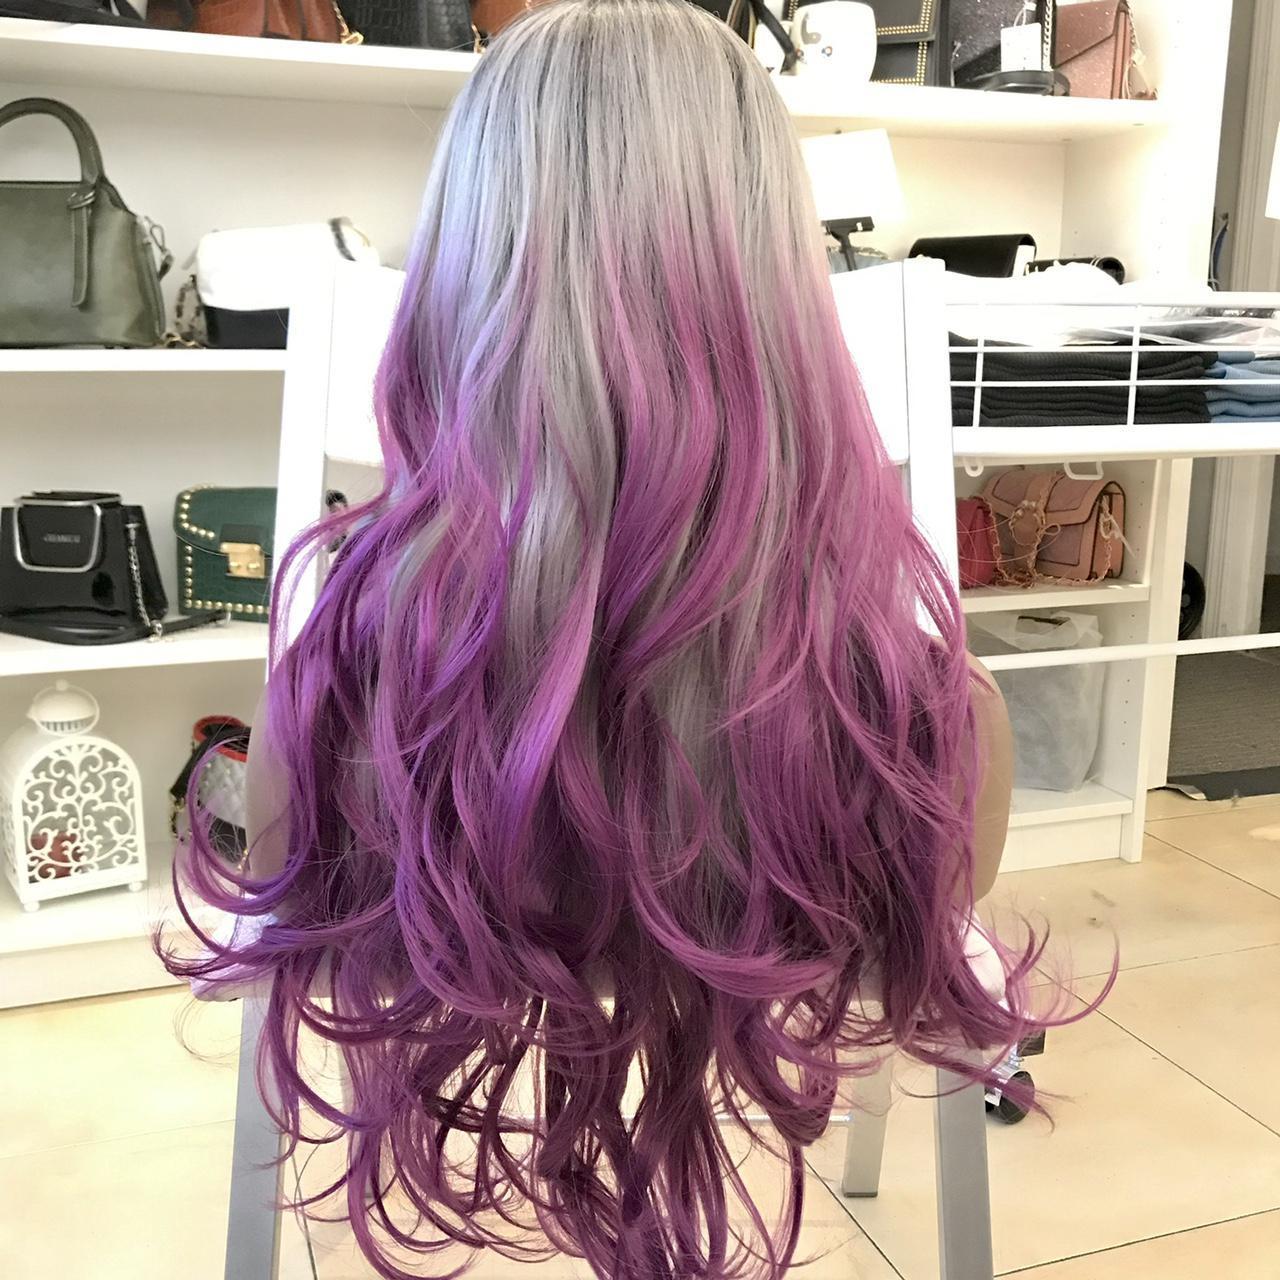 Product Image 1 - Human hair blend purple/sliver ombré